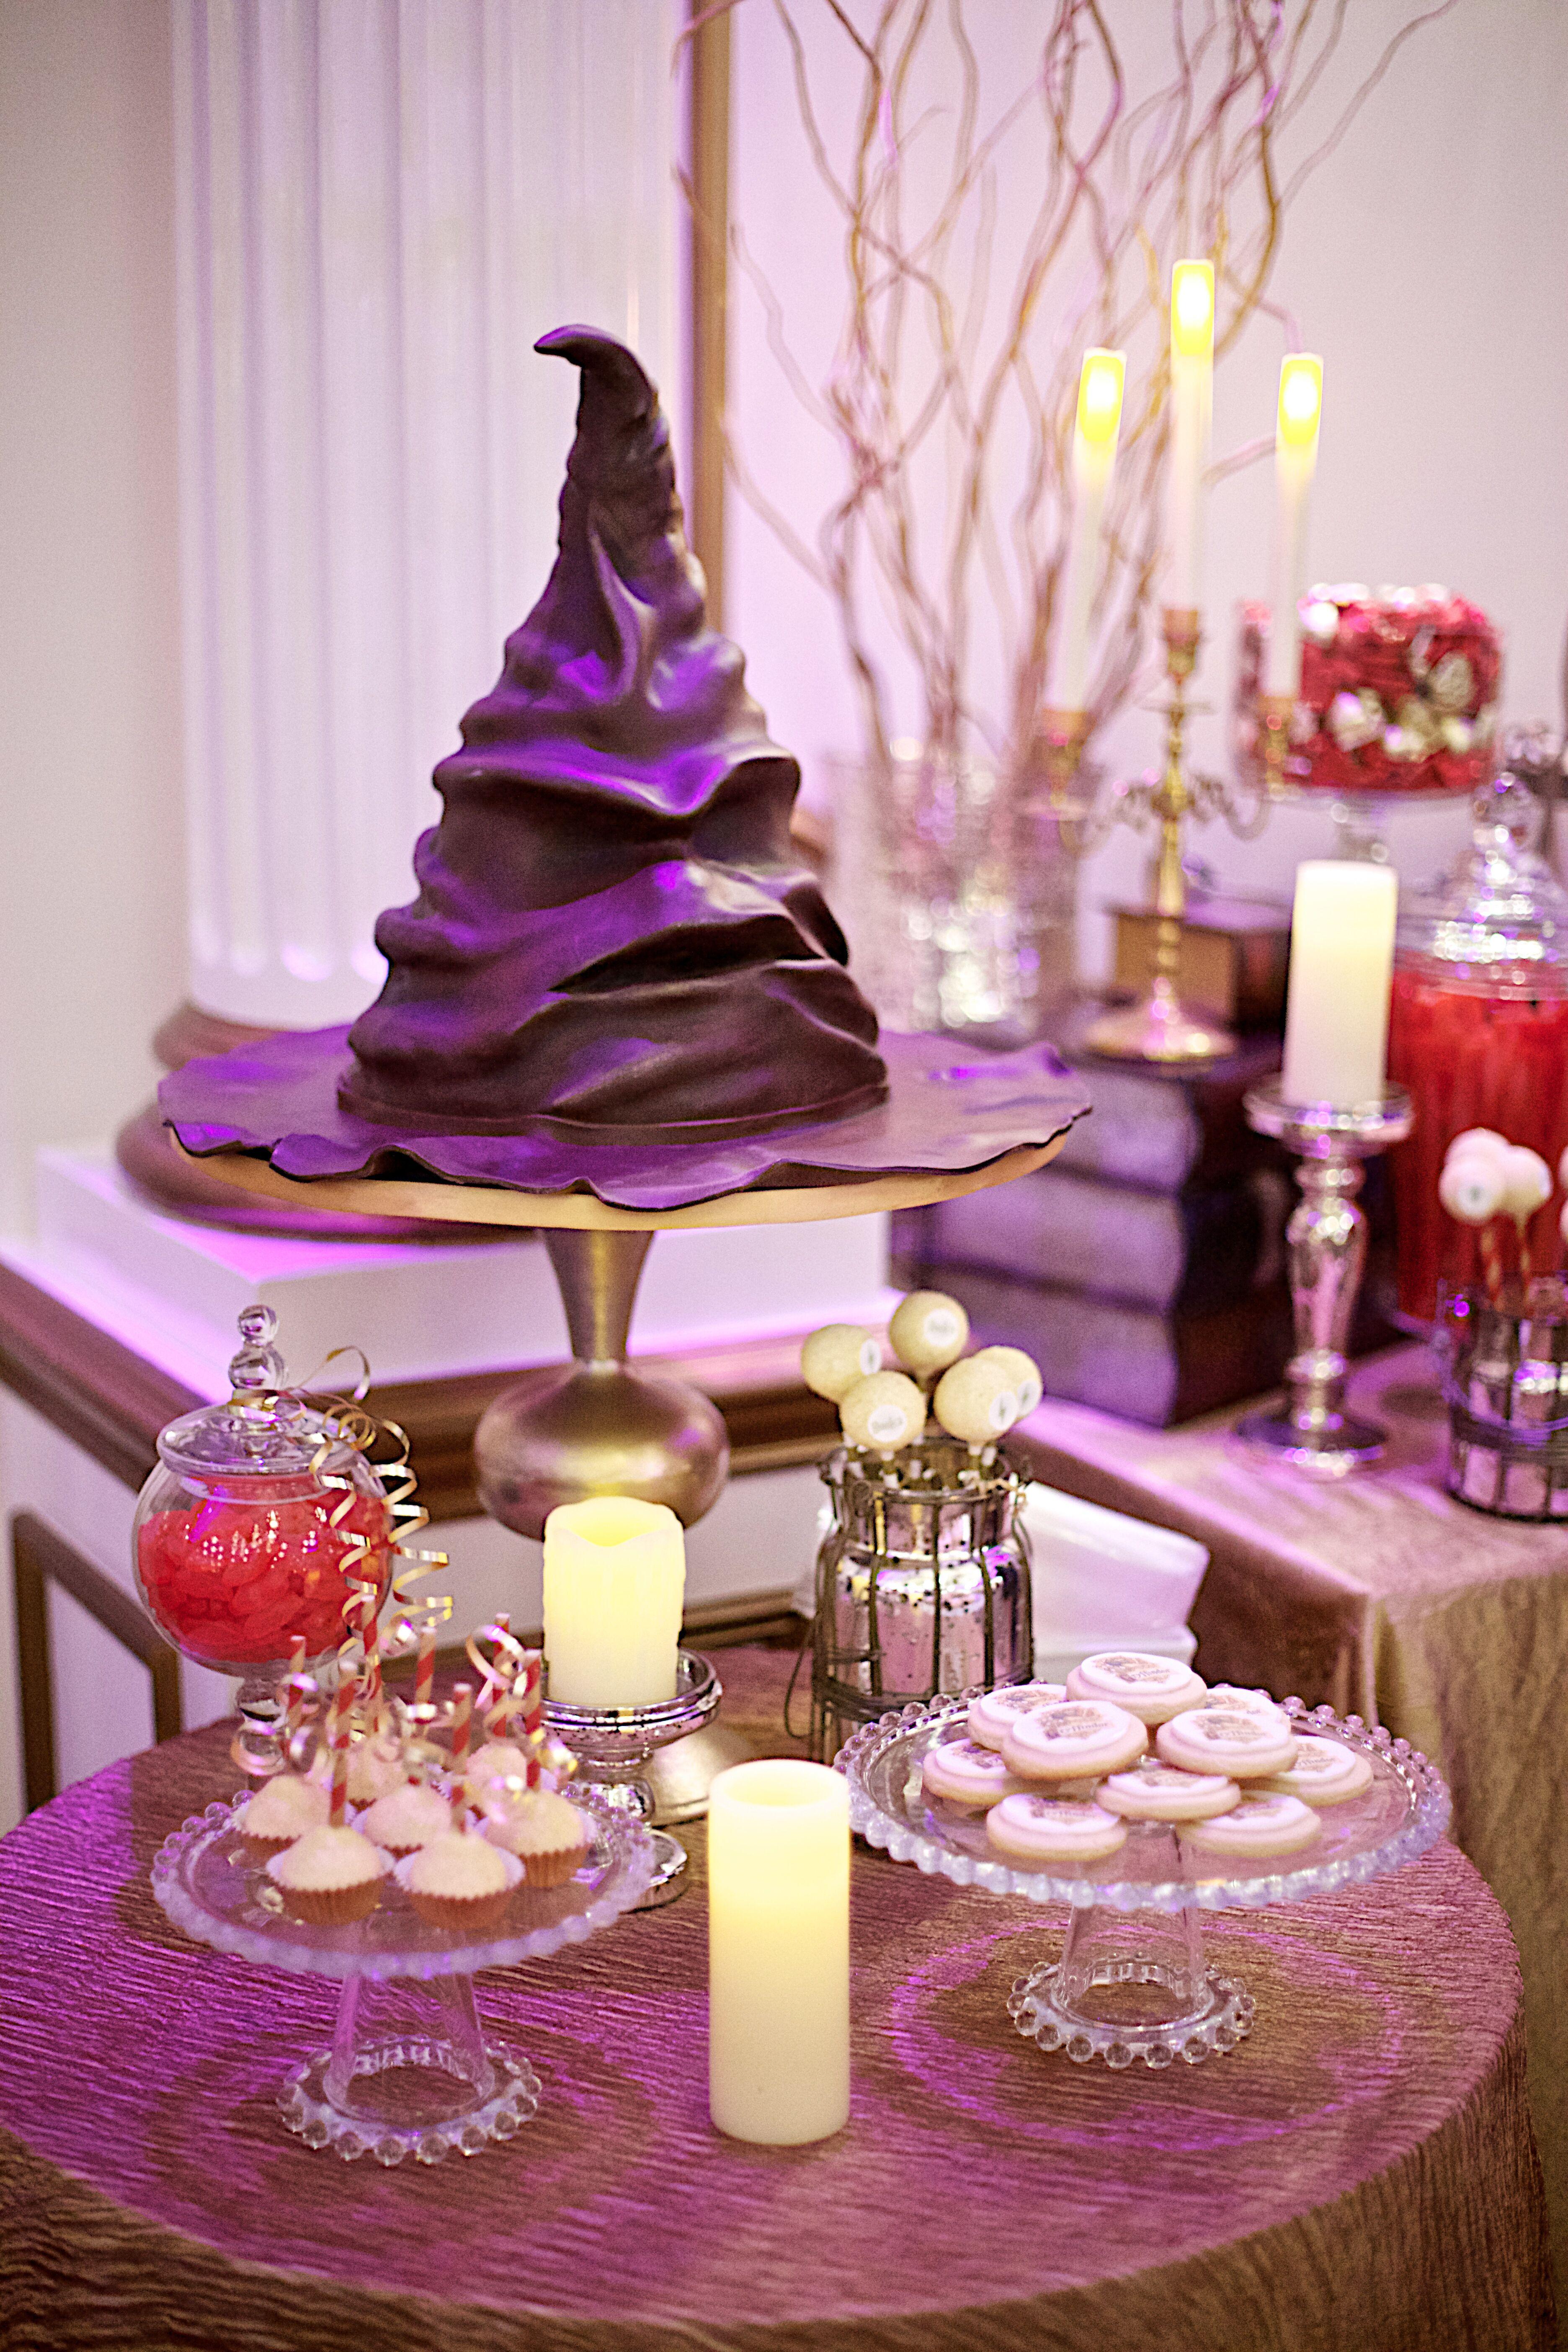 Harry Potter S Sorting Hat Groom S Cake